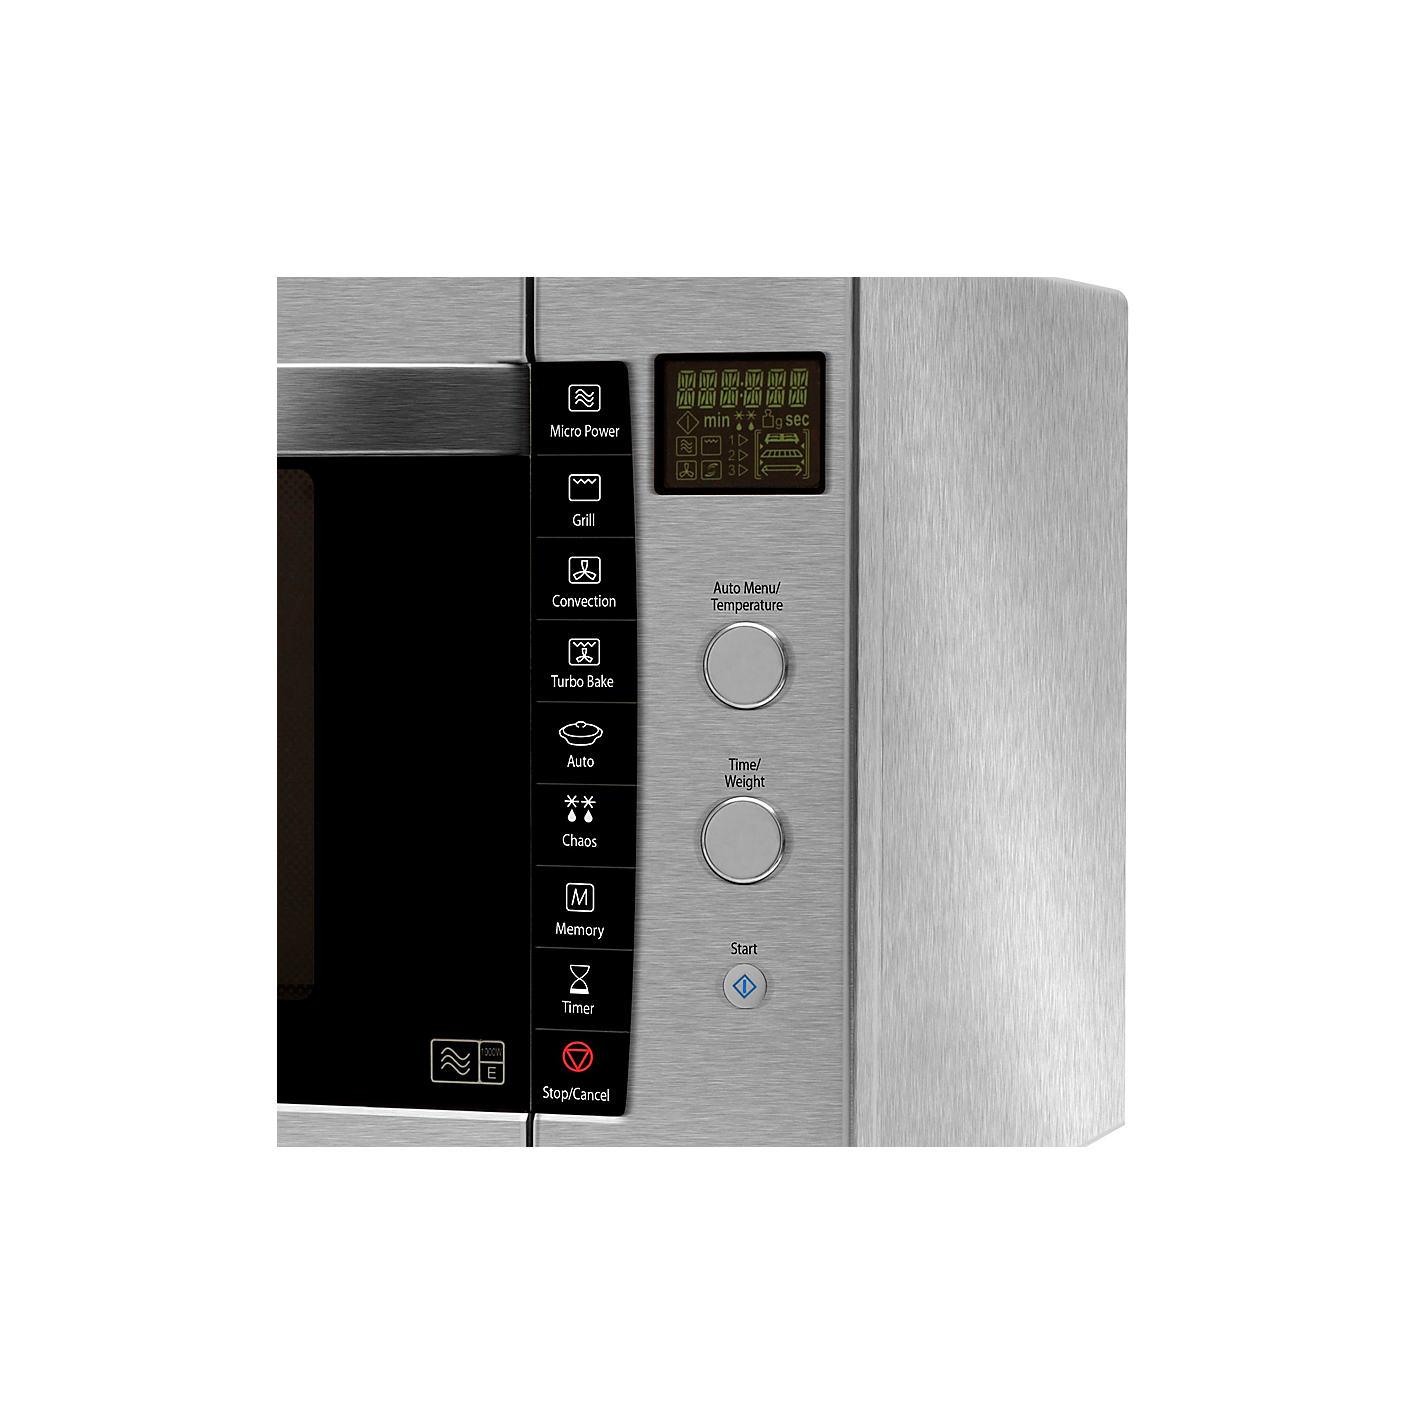 Panasonic Nn Cf778sbpq Combination Microwave Stainless Steel Online At Johnlewis